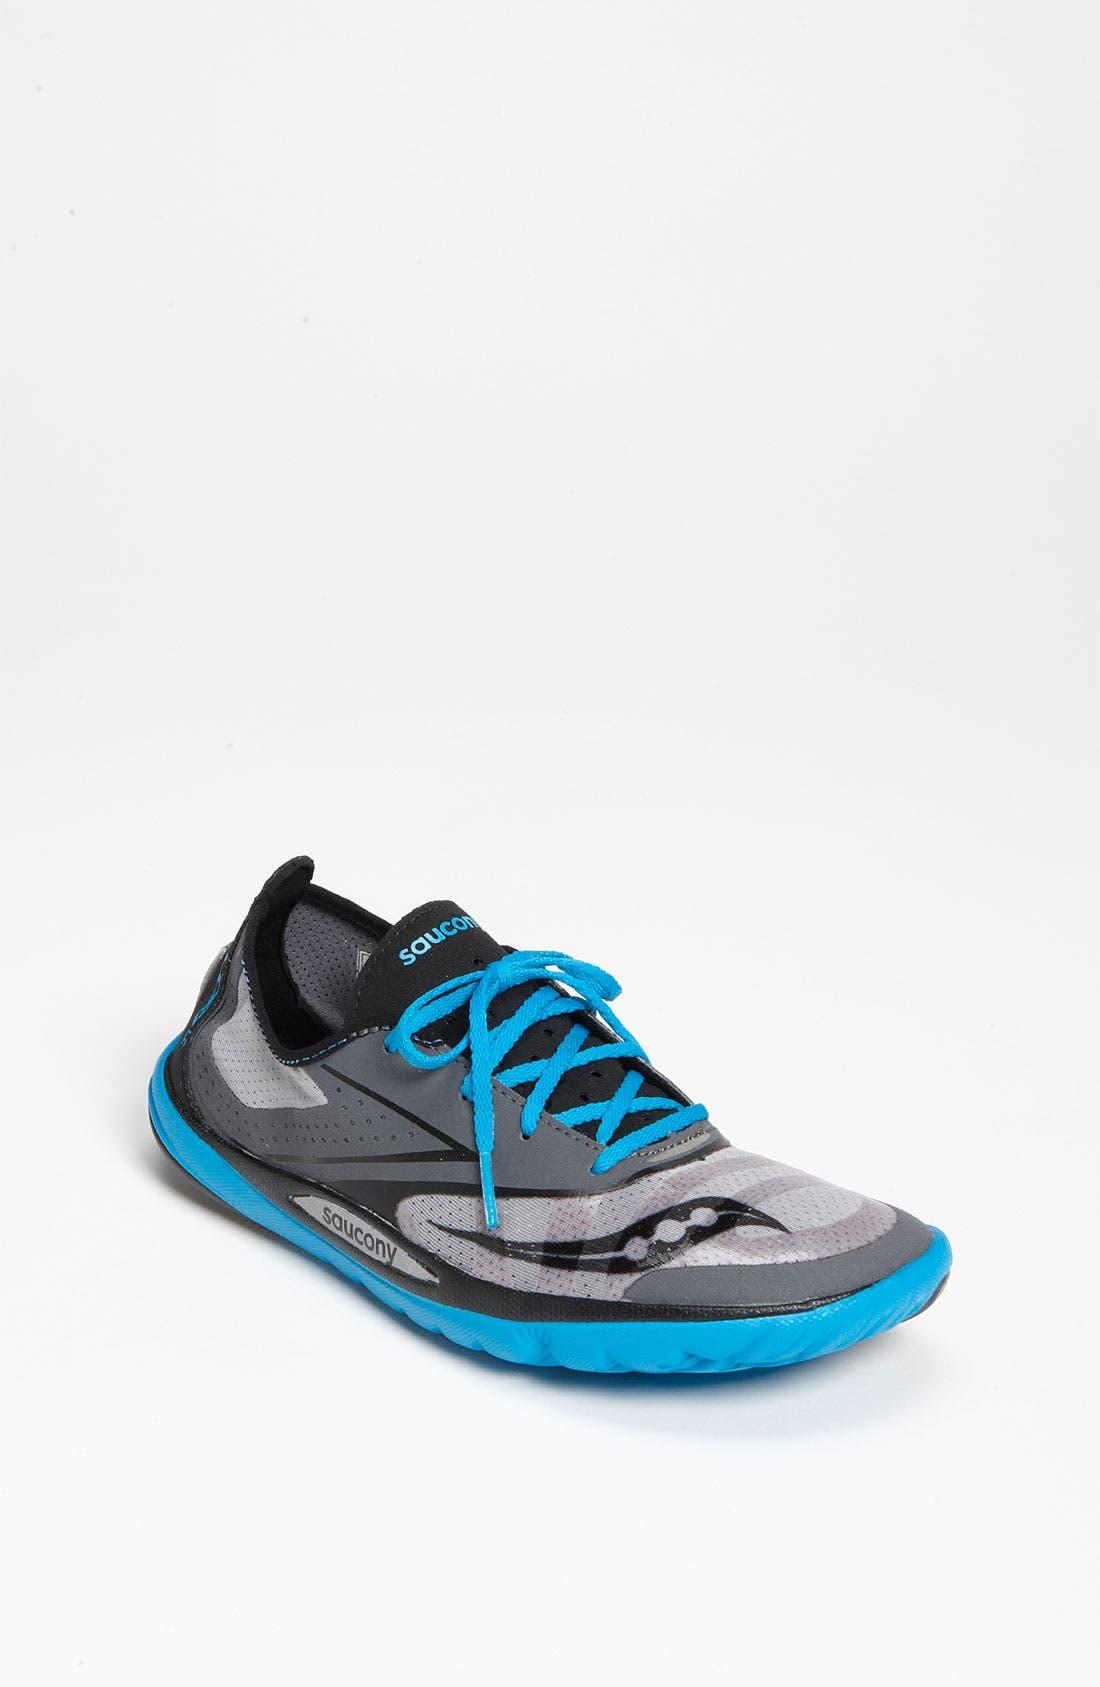 Alternate Image 1 Selected - Saucony 'Hattori' Running Shoe (Women)